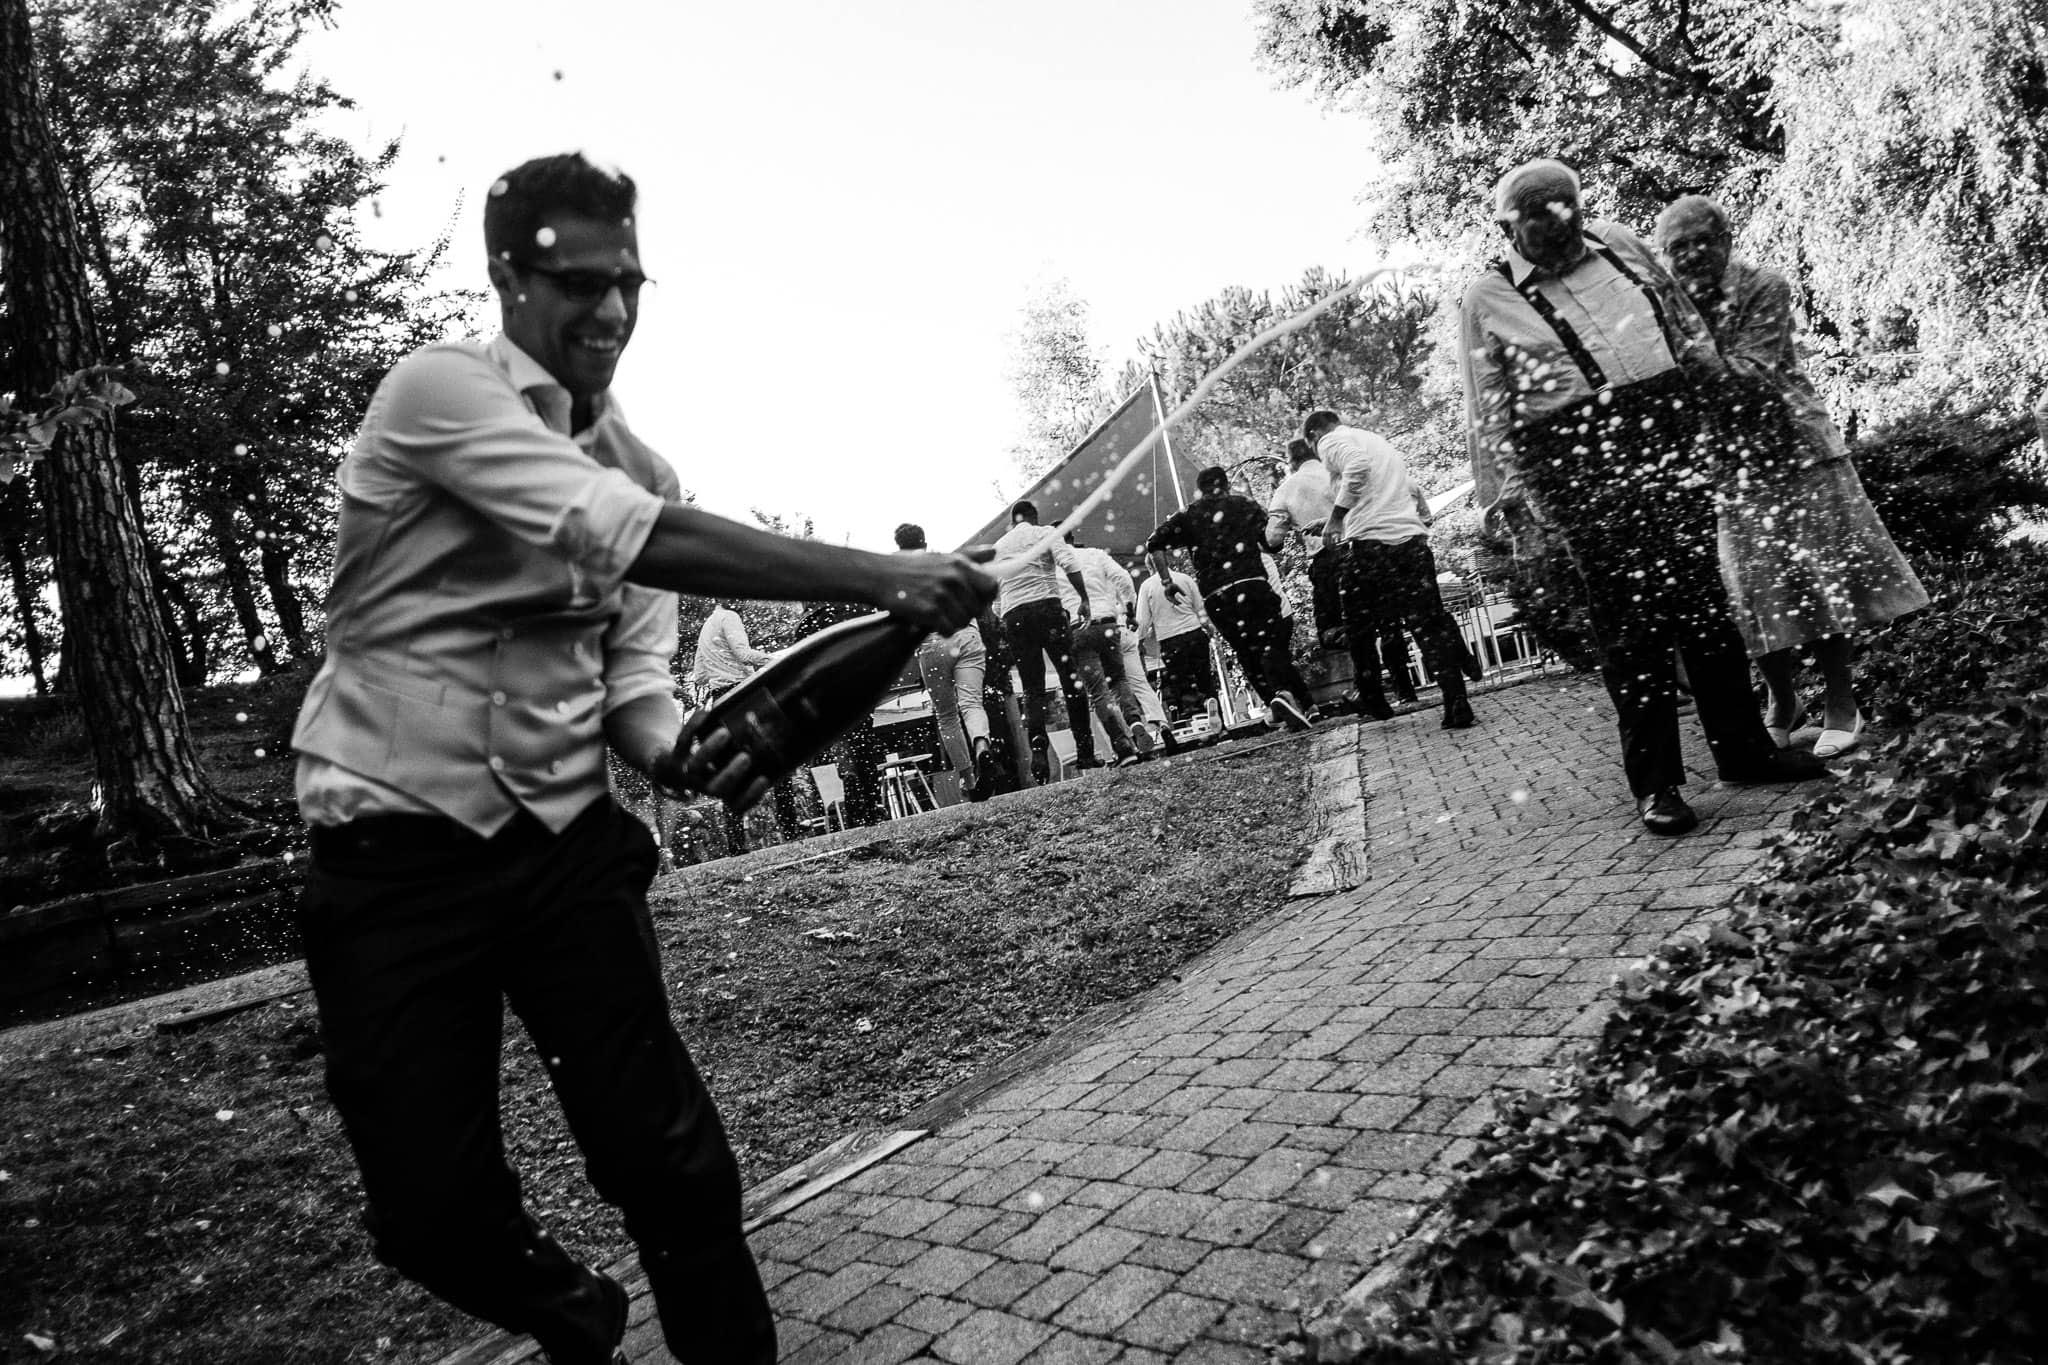 fotografo matrimonio cascina diodona varese lucarossifoto 00021